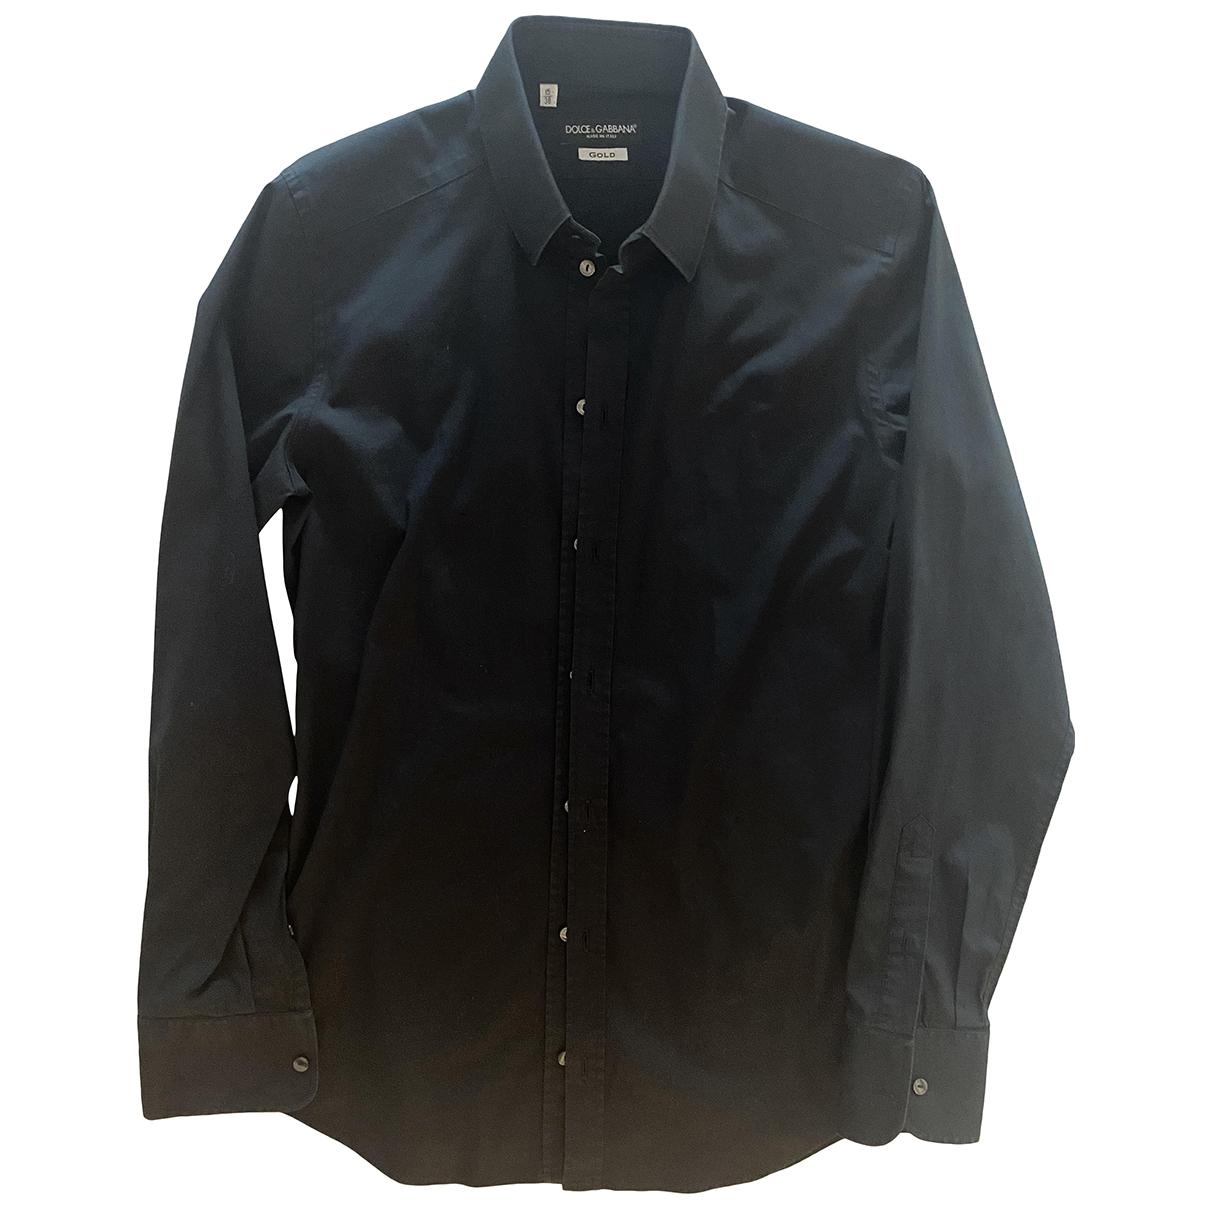 Dolce & Gabbana \N Black Cotton Shirts for Men 38 EU (tour de cou / collar)